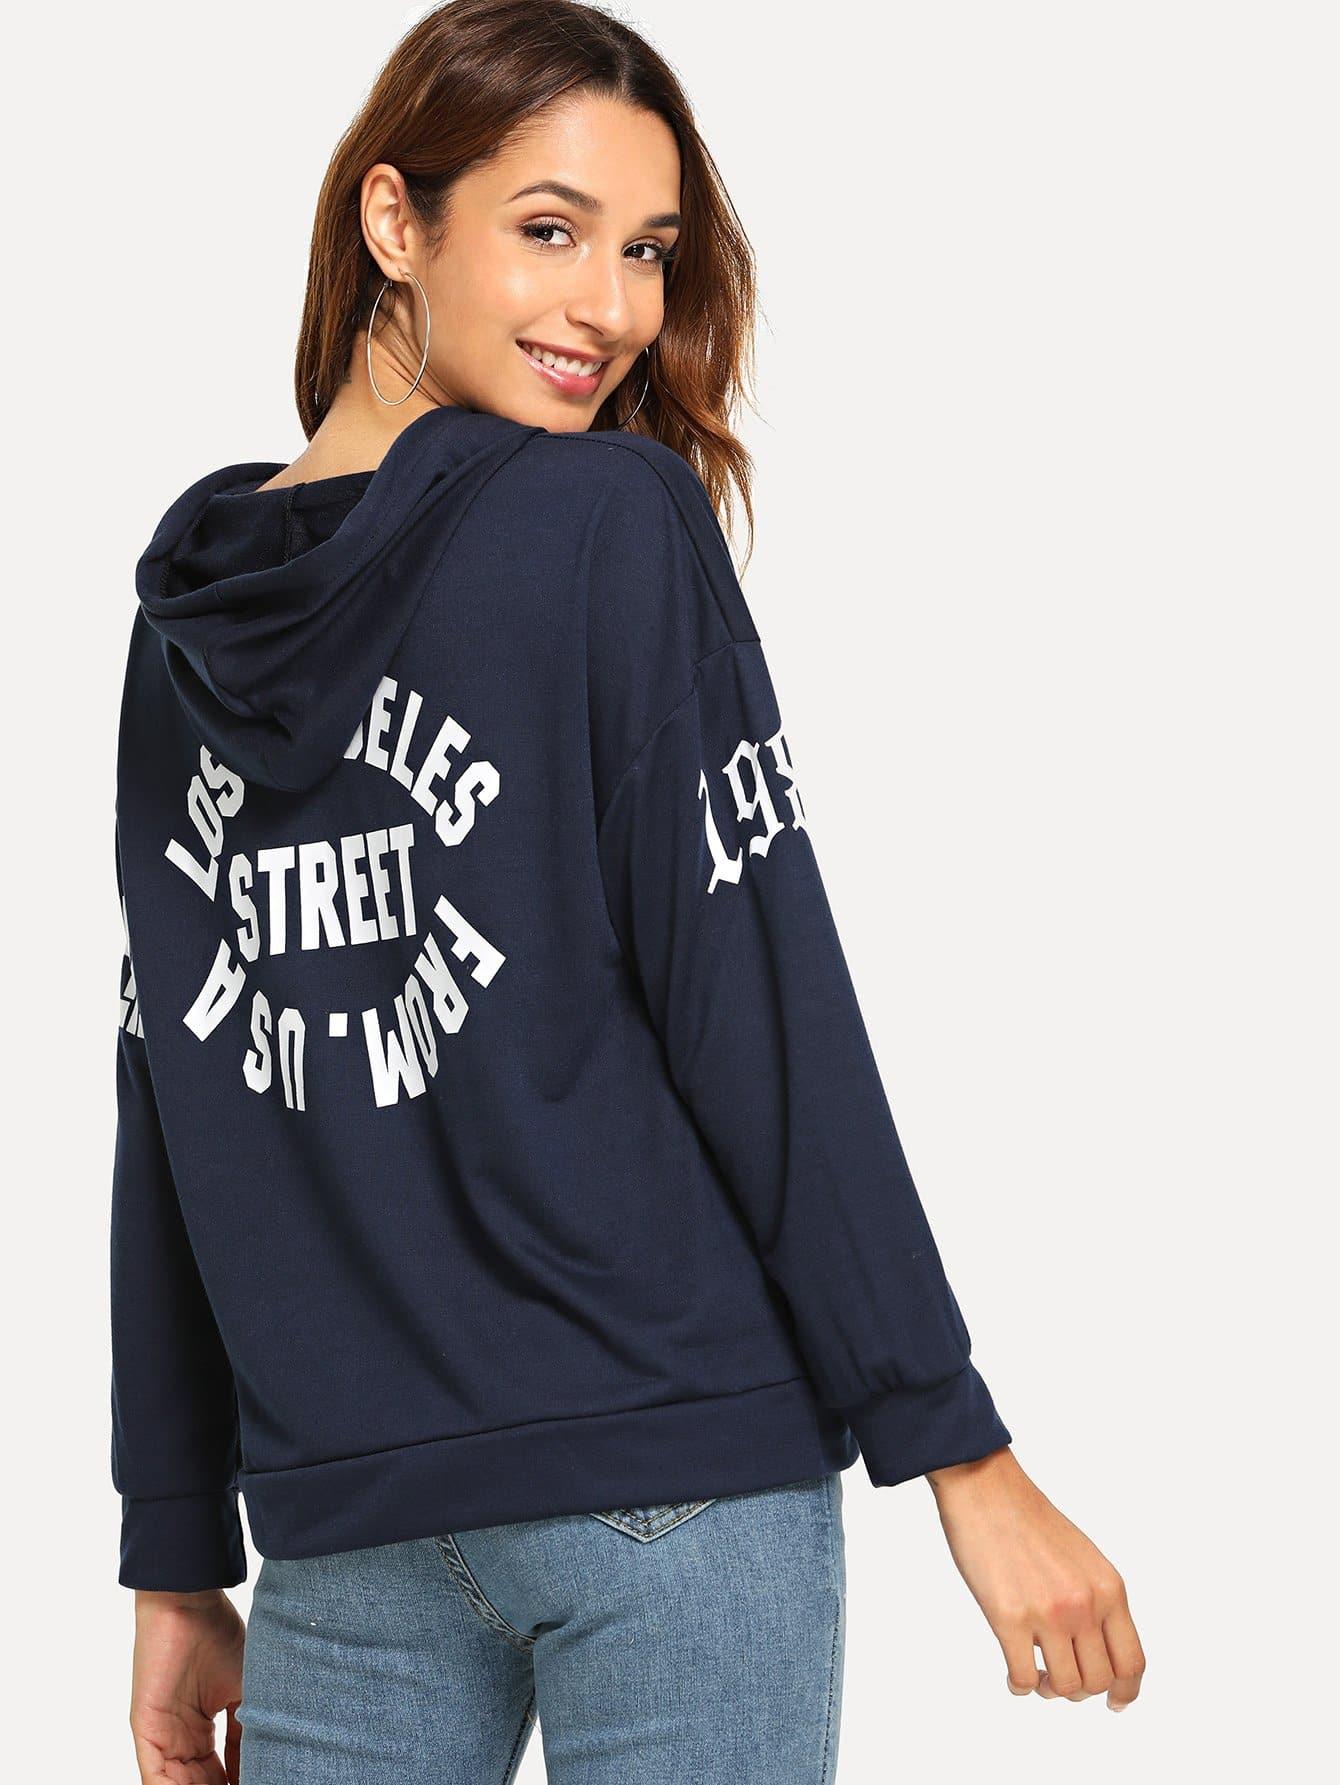 Letter Print Hooded Sweatshirt